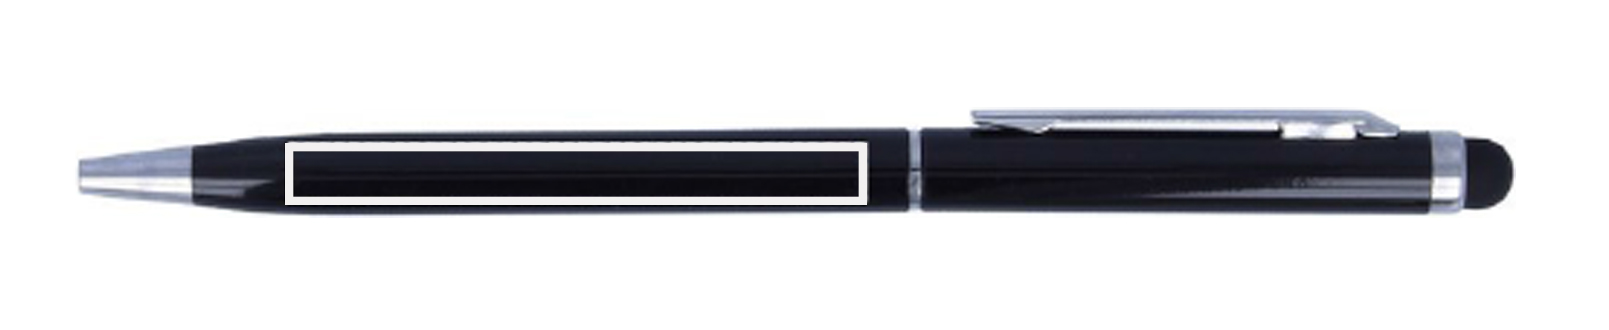 metal-pen-stylus-8209-print-area-1